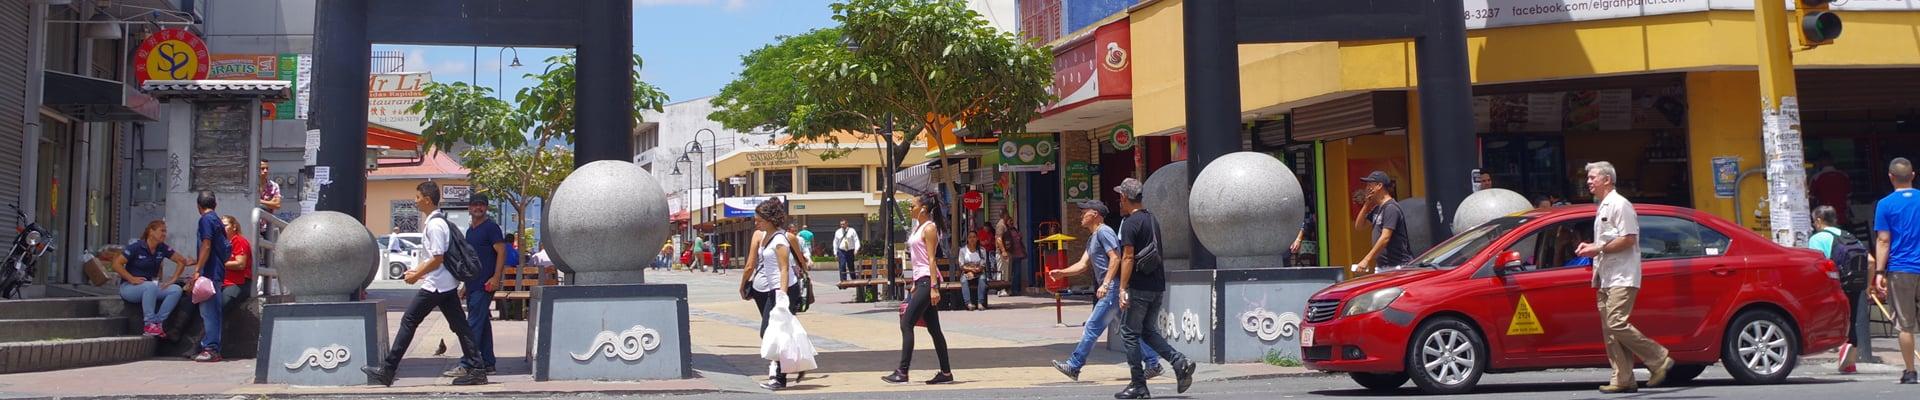 Chinatown in San Jose, Costa Rica